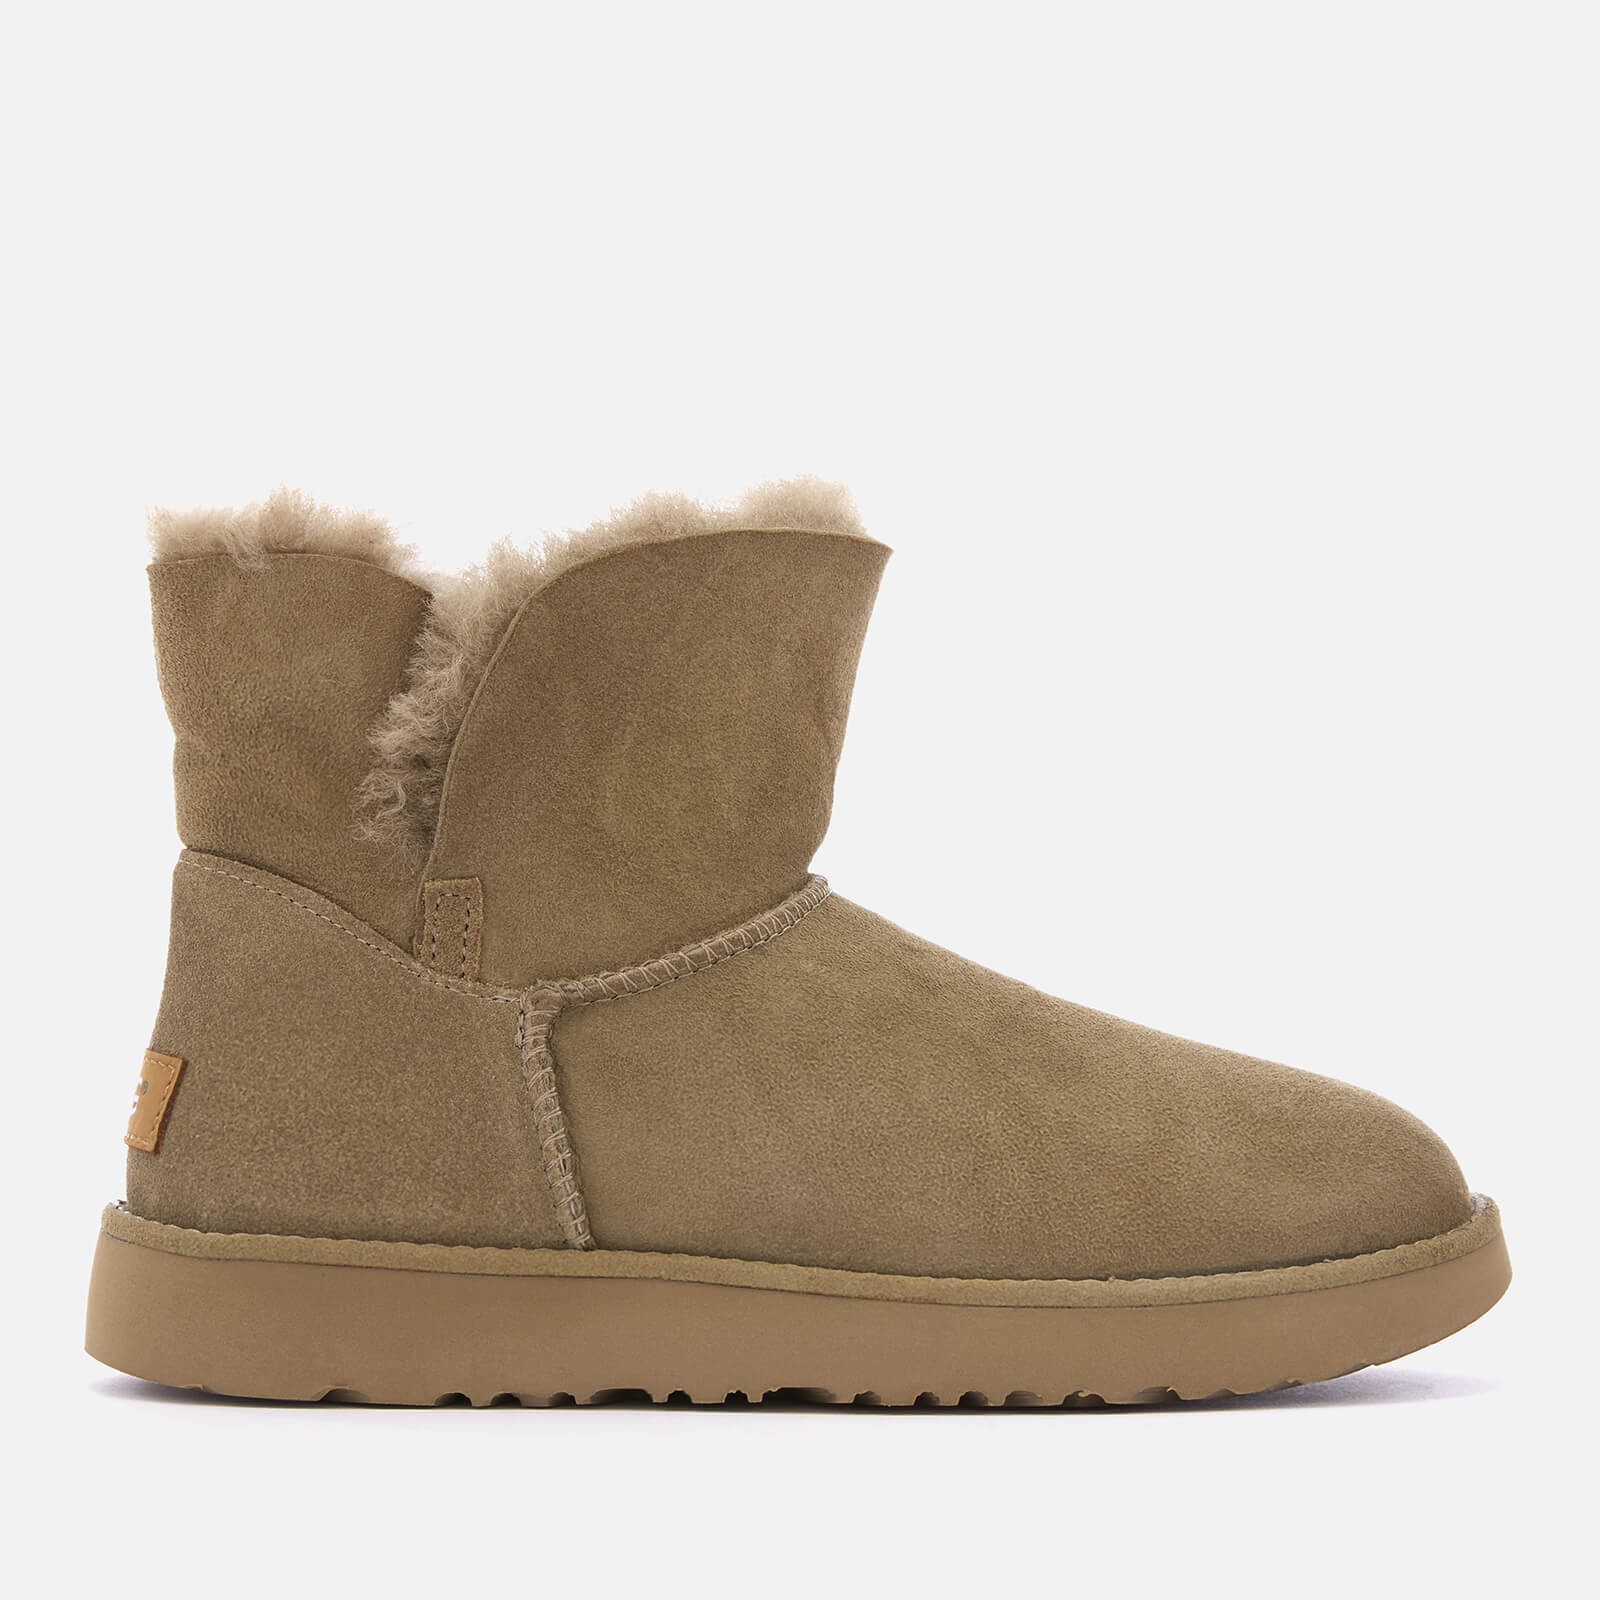 adc880fbe26 UGG Women's Classic Cuff Mini Sheepskin Boots - Antilope